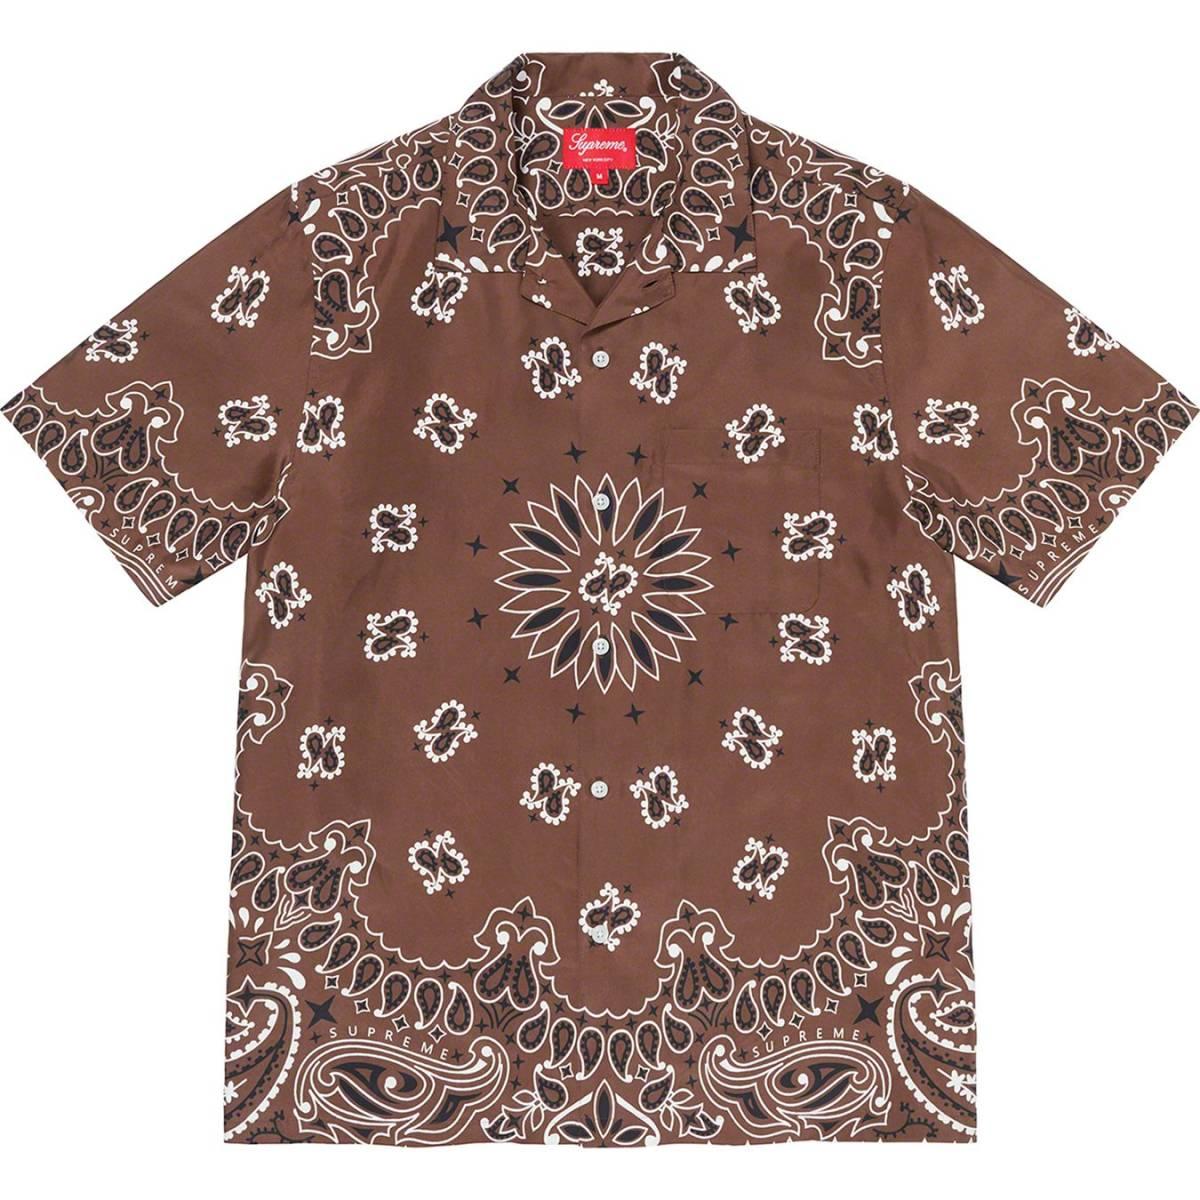 【新品未開封】Supreme Bandana Silk S/S Shirt Brown Medium 21SS 正規品付属品完備 バ